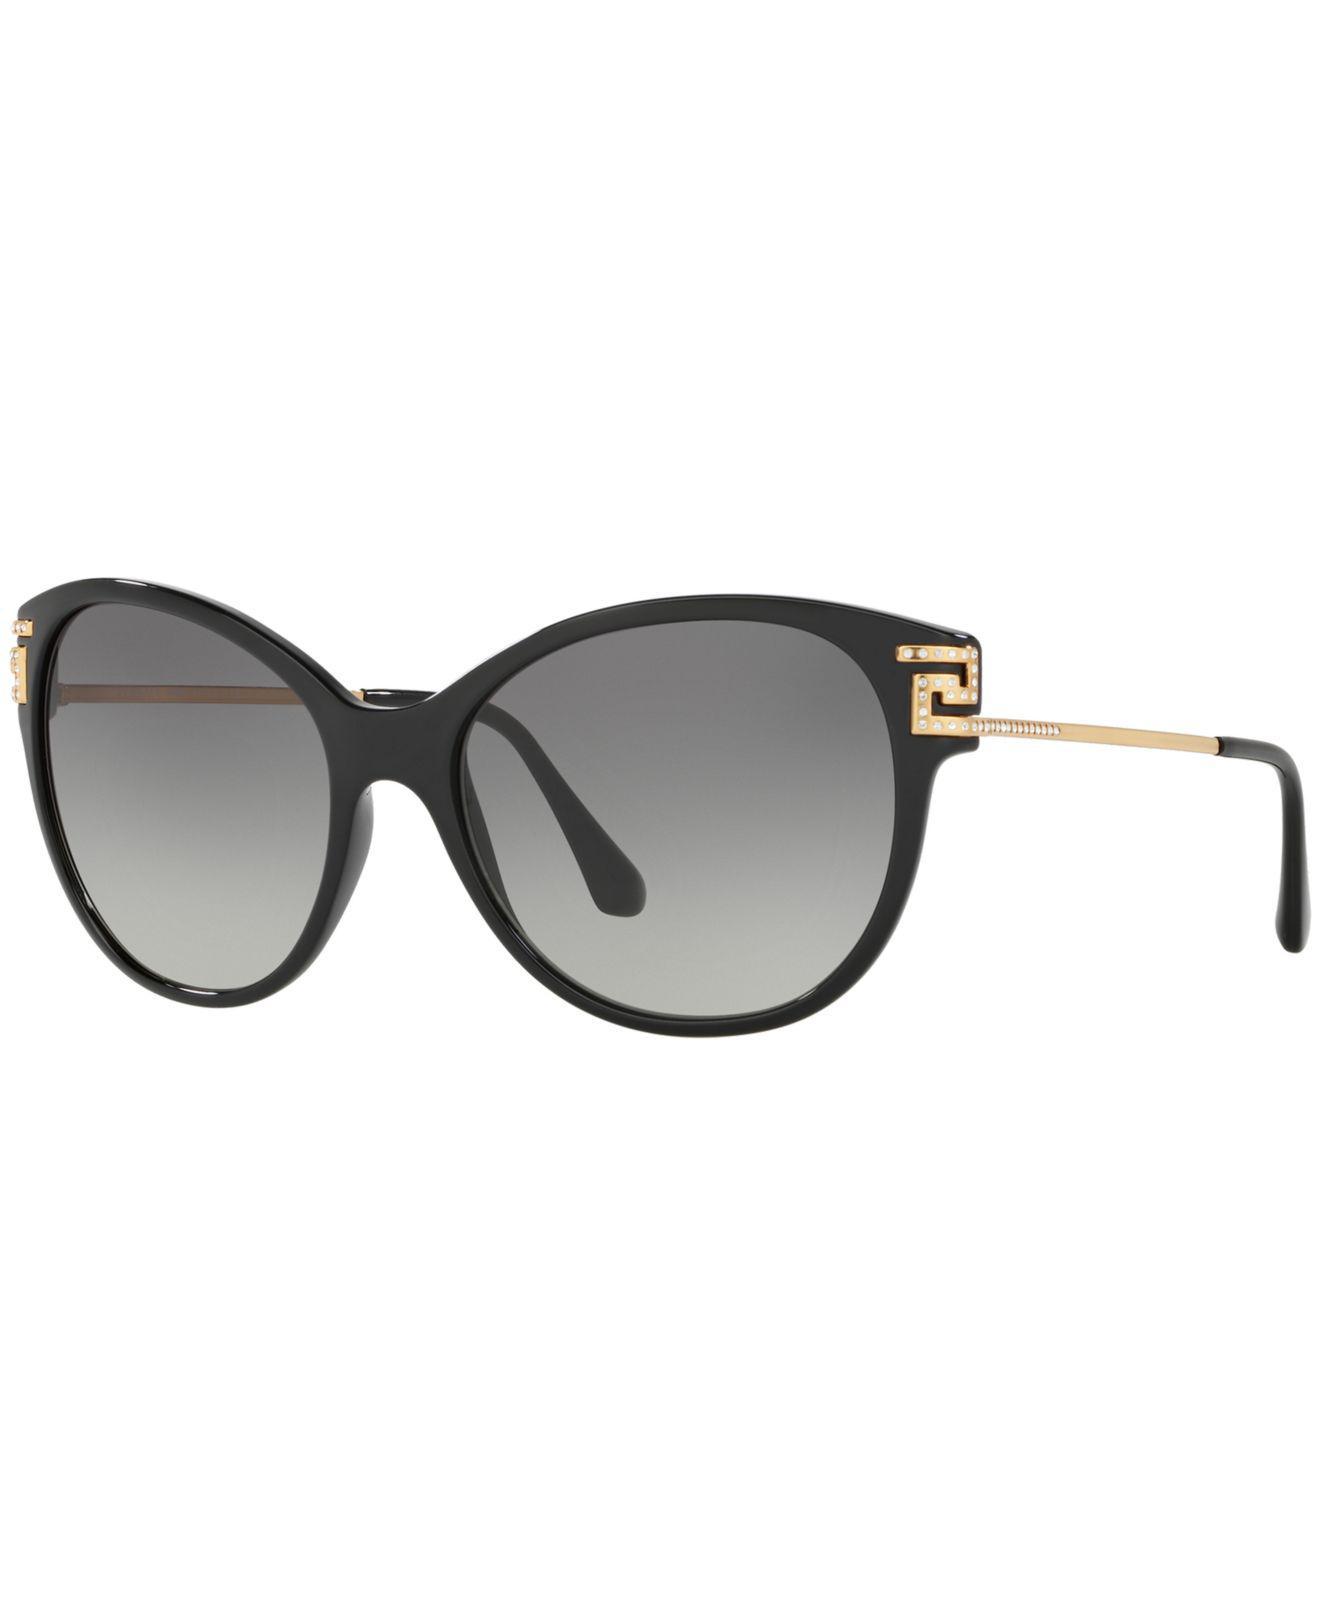 7c787fff1915 Versace. Women s Black Sunglasses ...